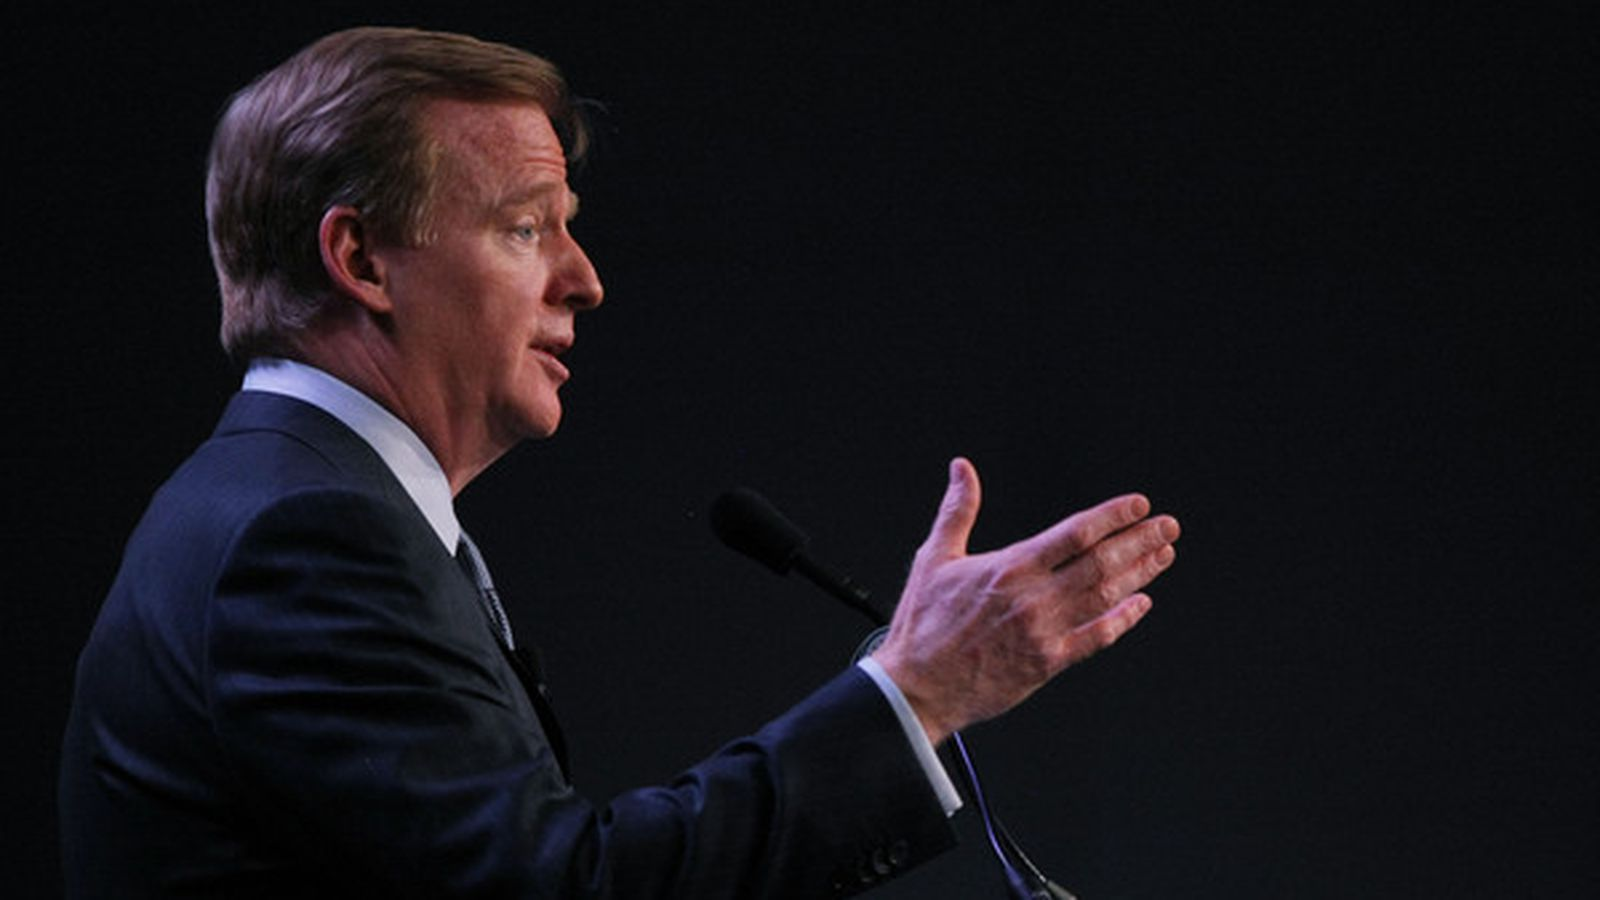 Roger Goodell谈到球员安全,NFL的未来等等